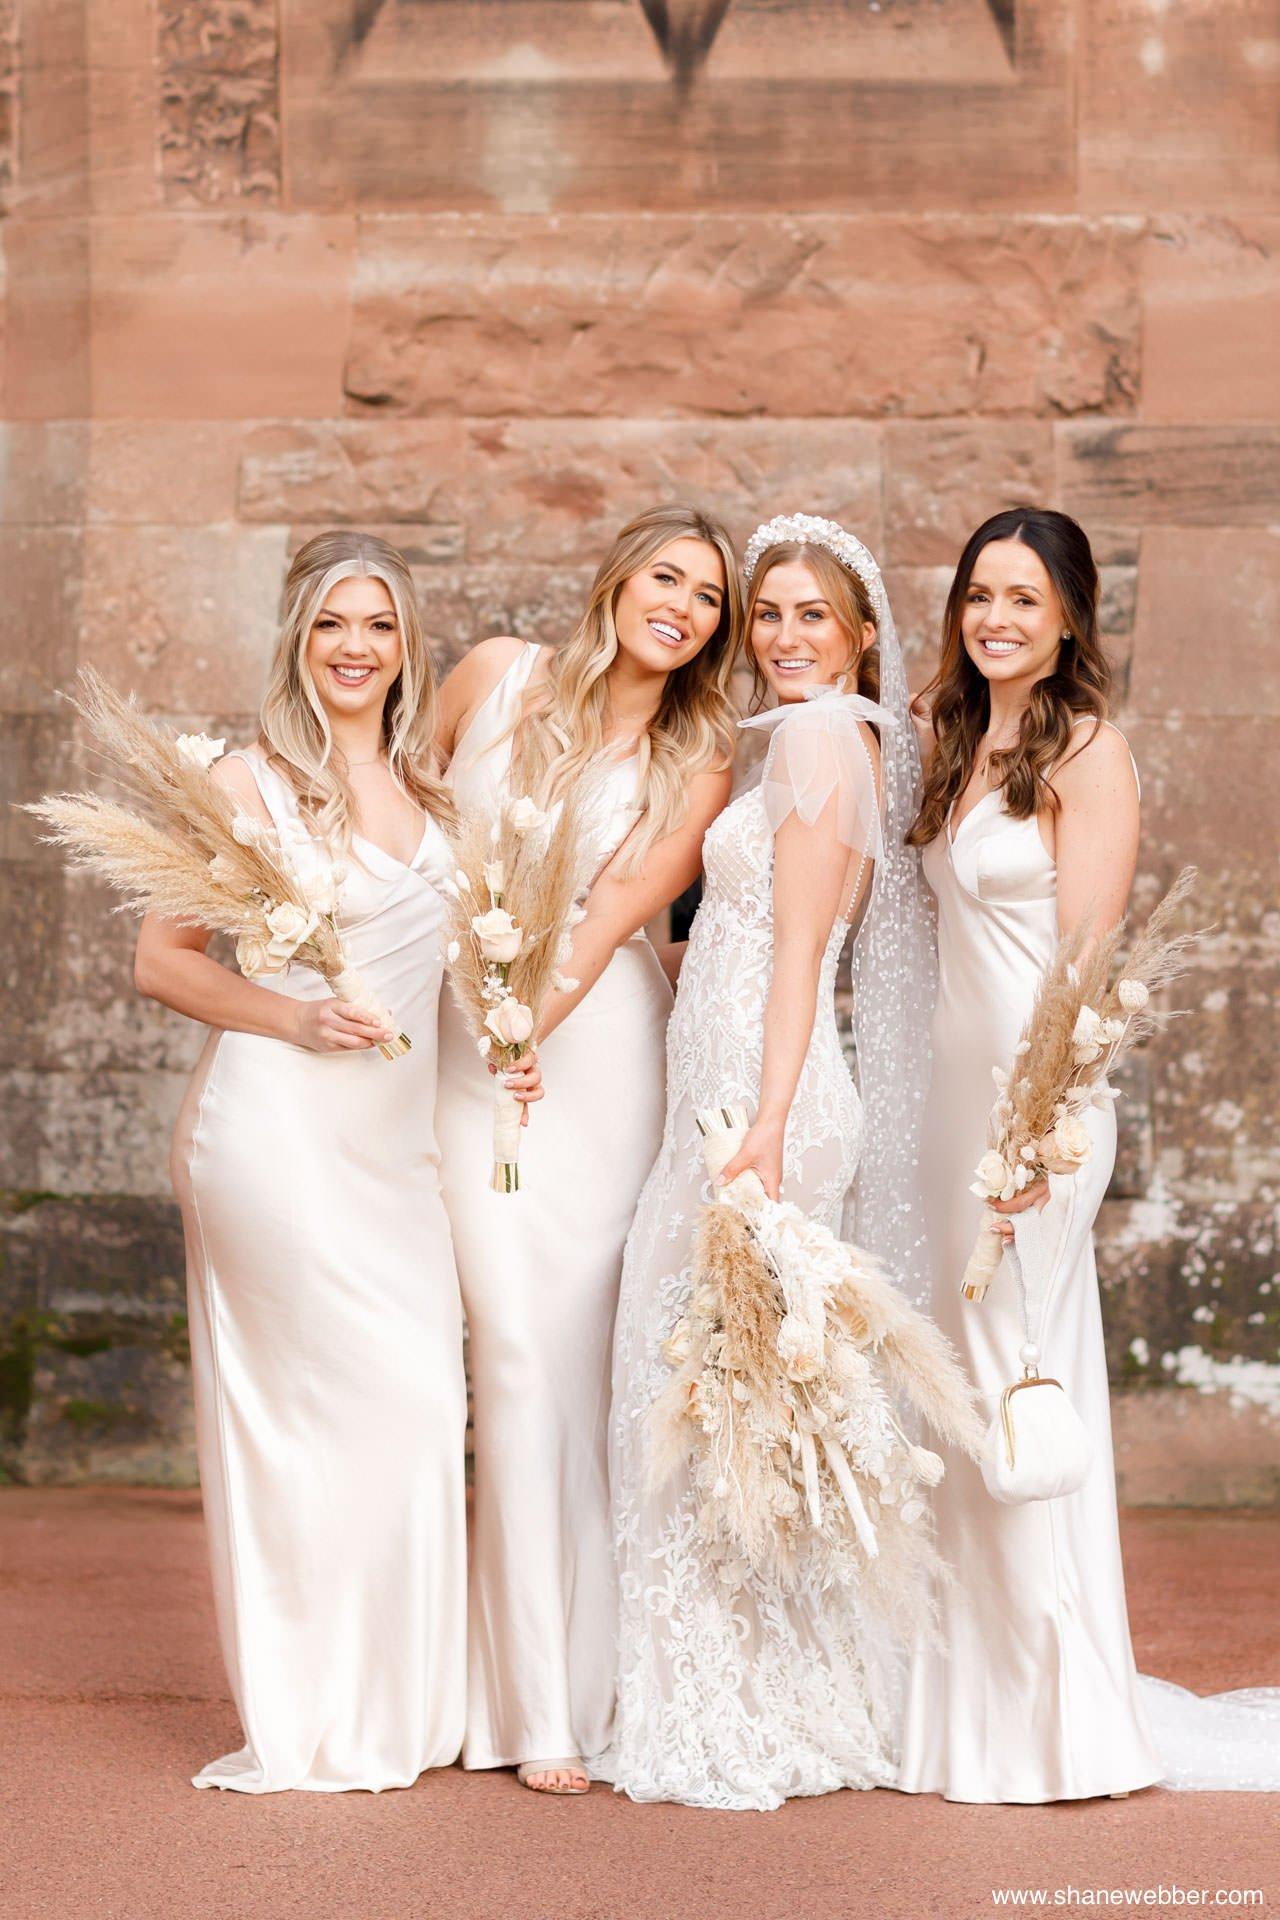 Bridal photo at Peckforton Castle wearing Berta dress